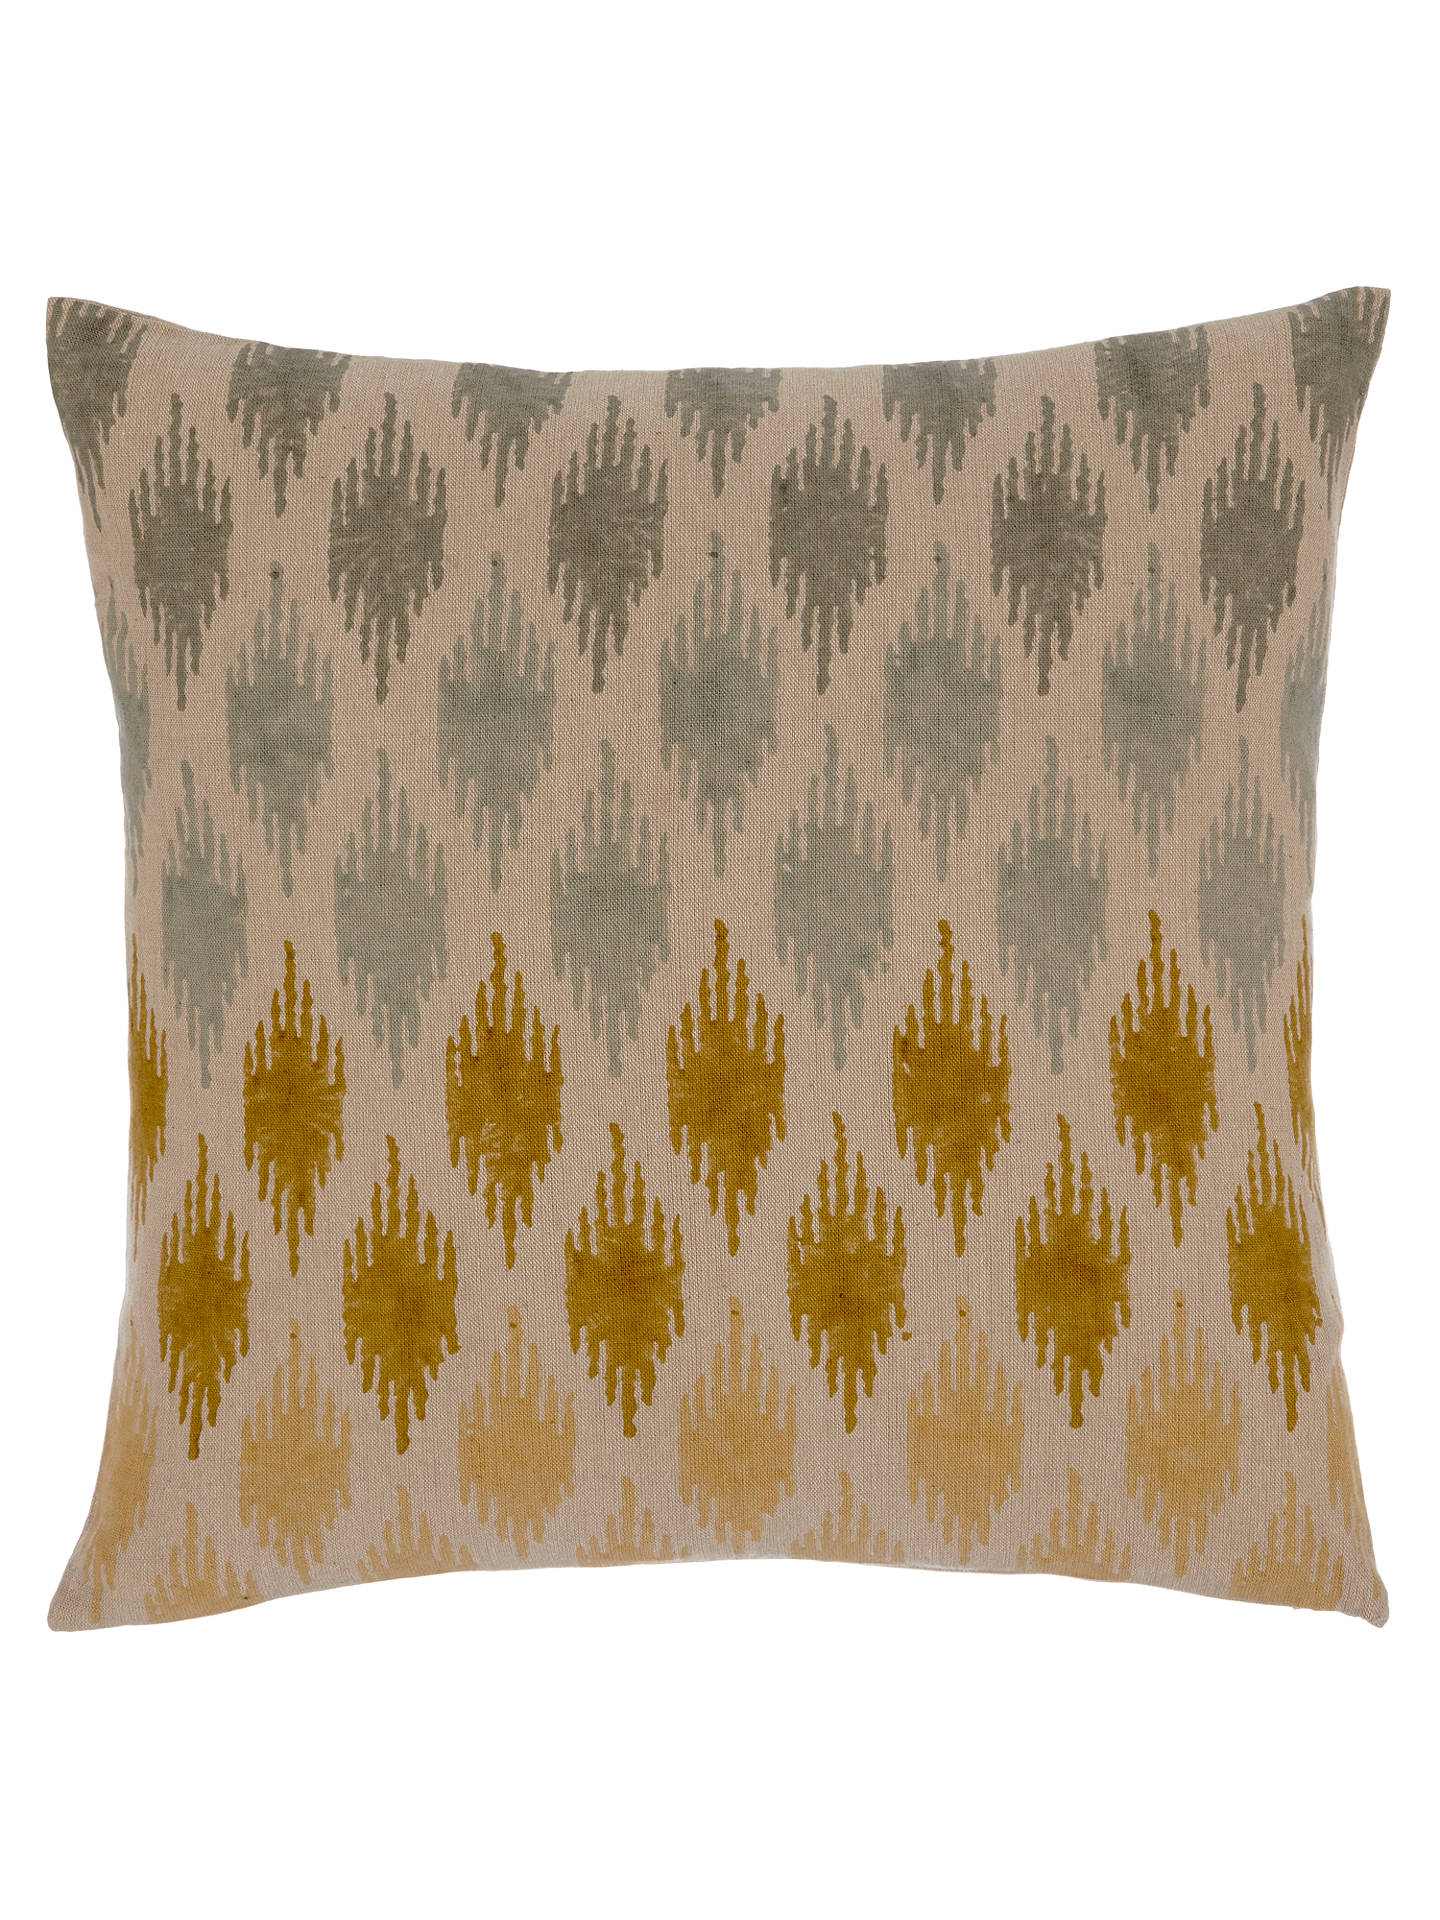 john lewis ikat ombre cushion at john lewis partners. Black Bedroom Furniture Sets. Home Design Ideas